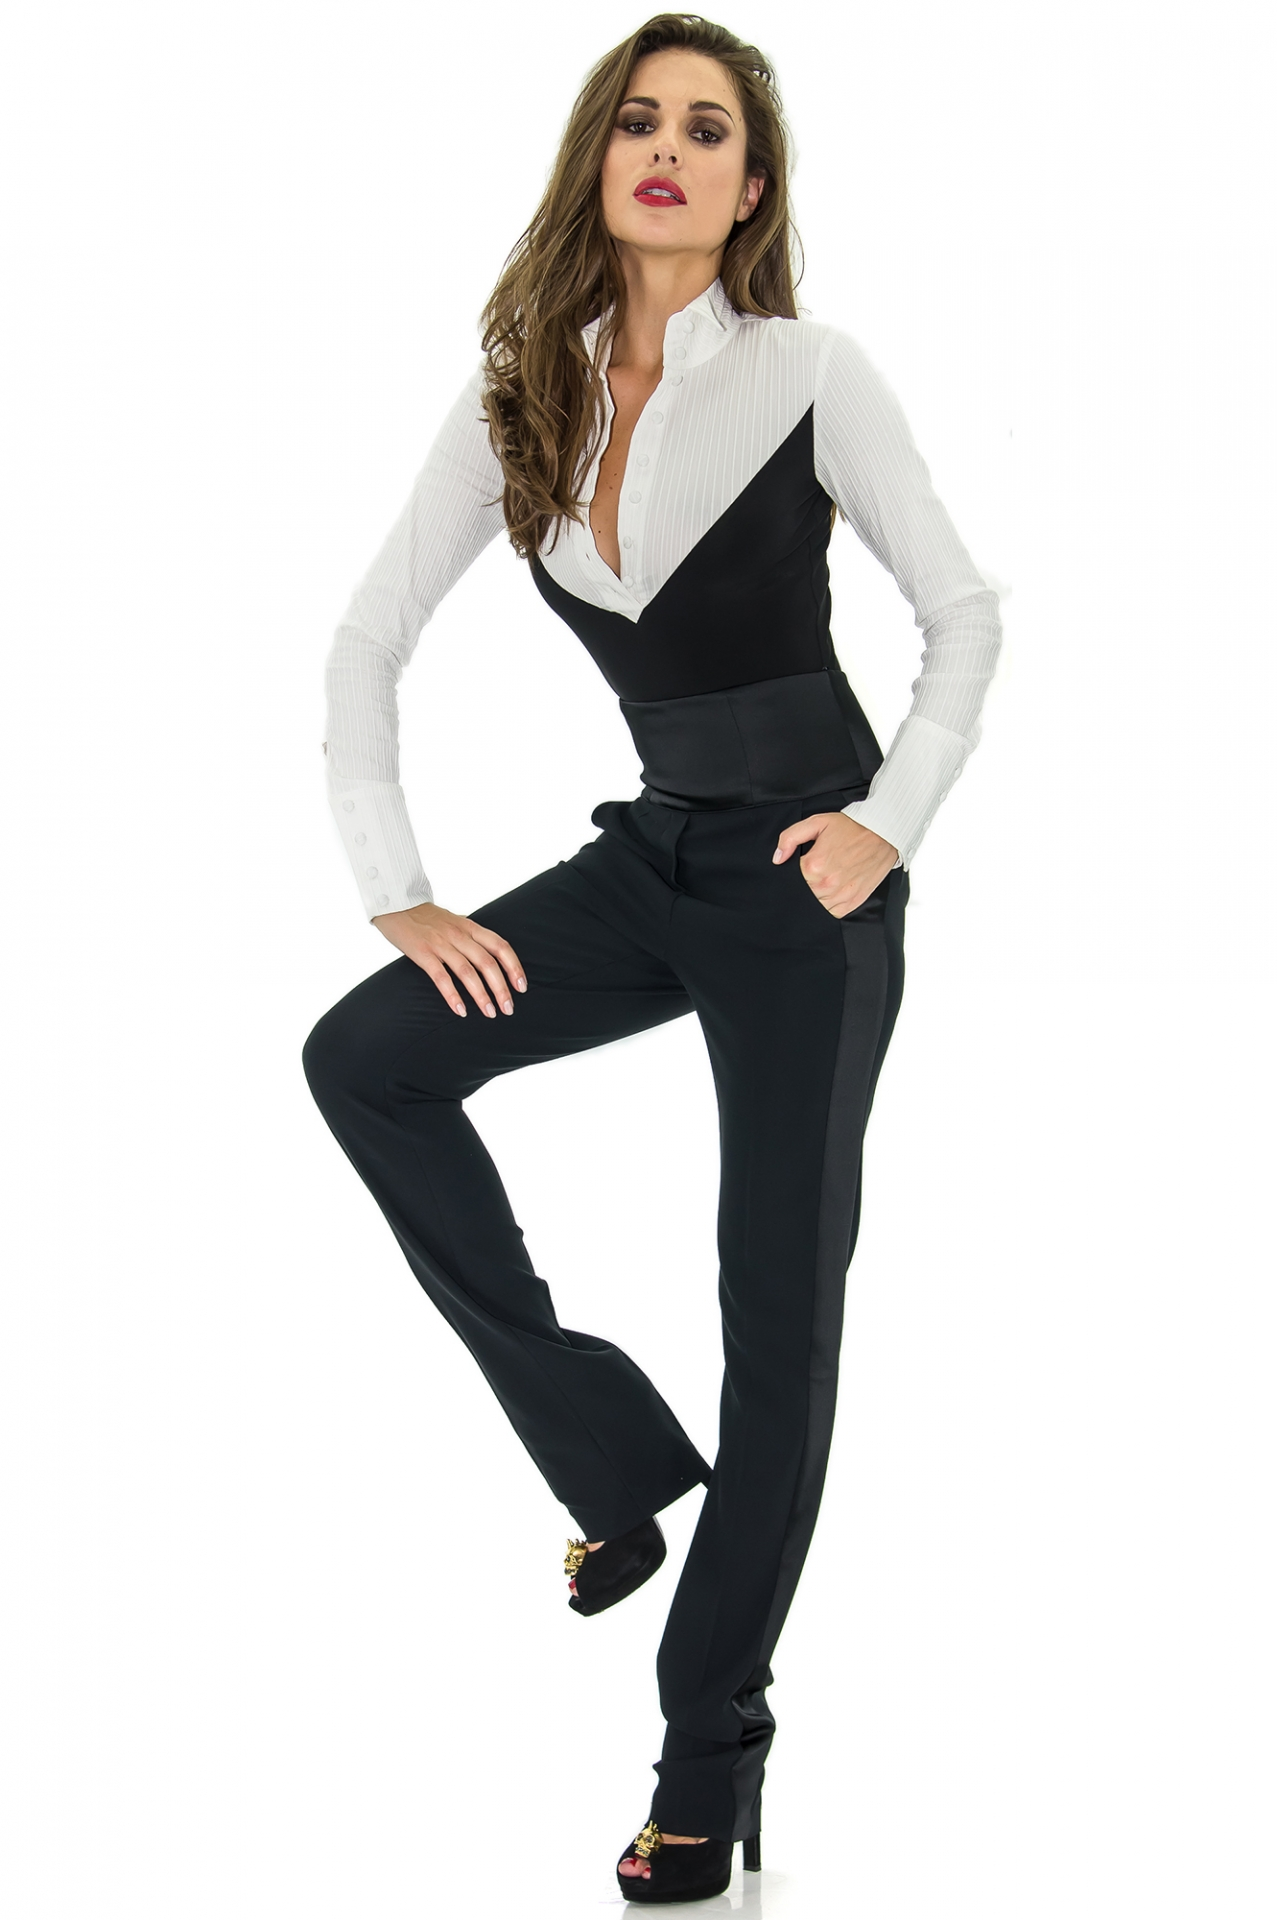 smoking pantalon taille haute alexandrina turcan stefanie renoma. Black Bedroom Furniture Sets. Home Design Ideas